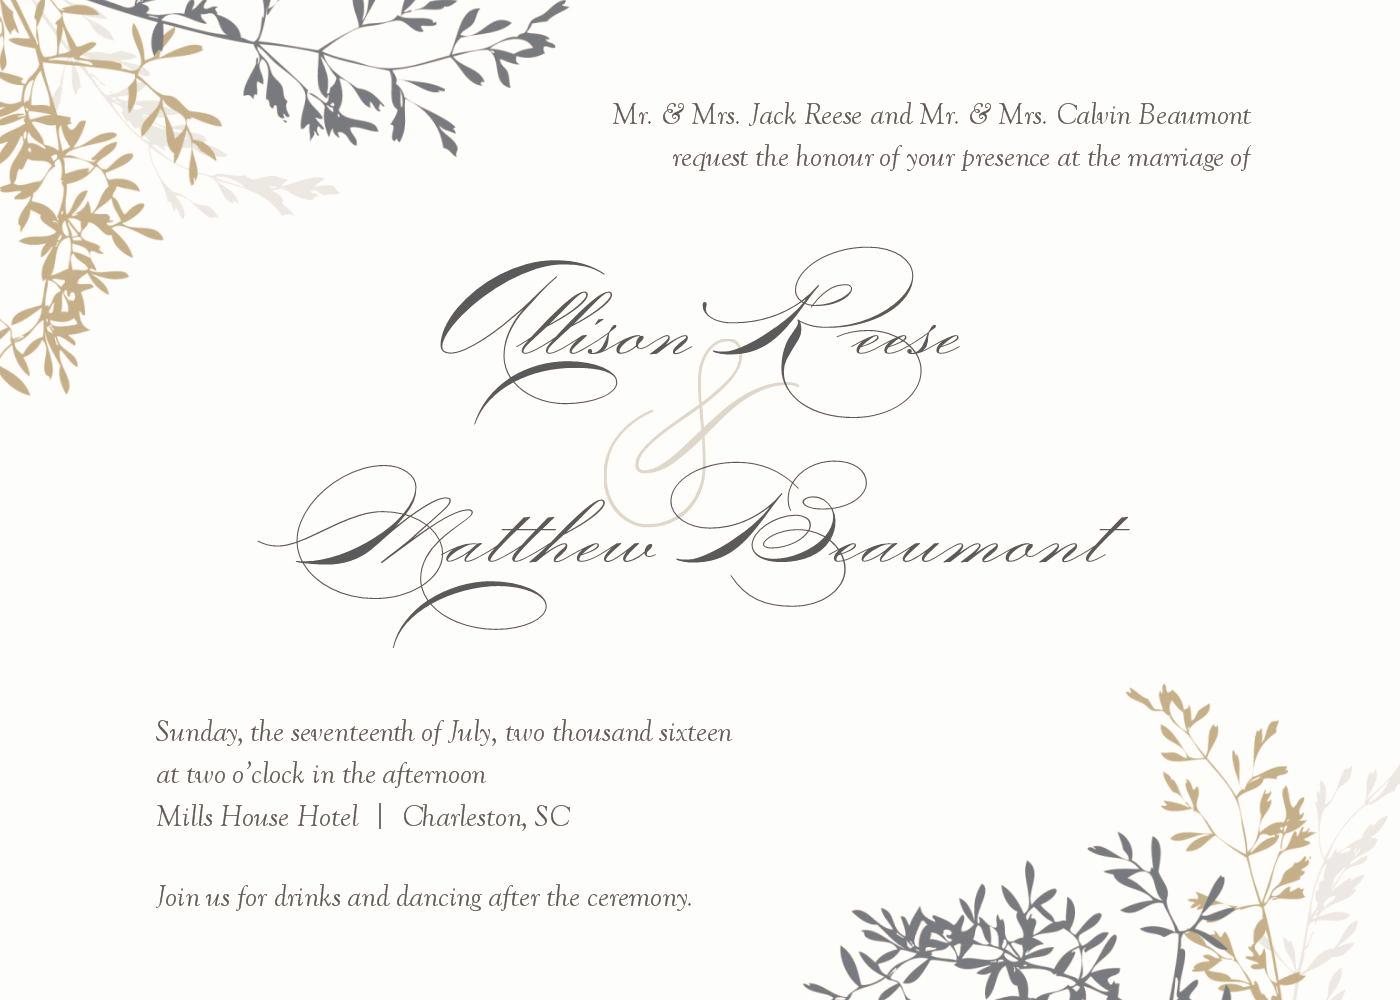 Free Wedding Invitation Templates Download Unique Wedding Invitation Wedding Invitations Template Superb